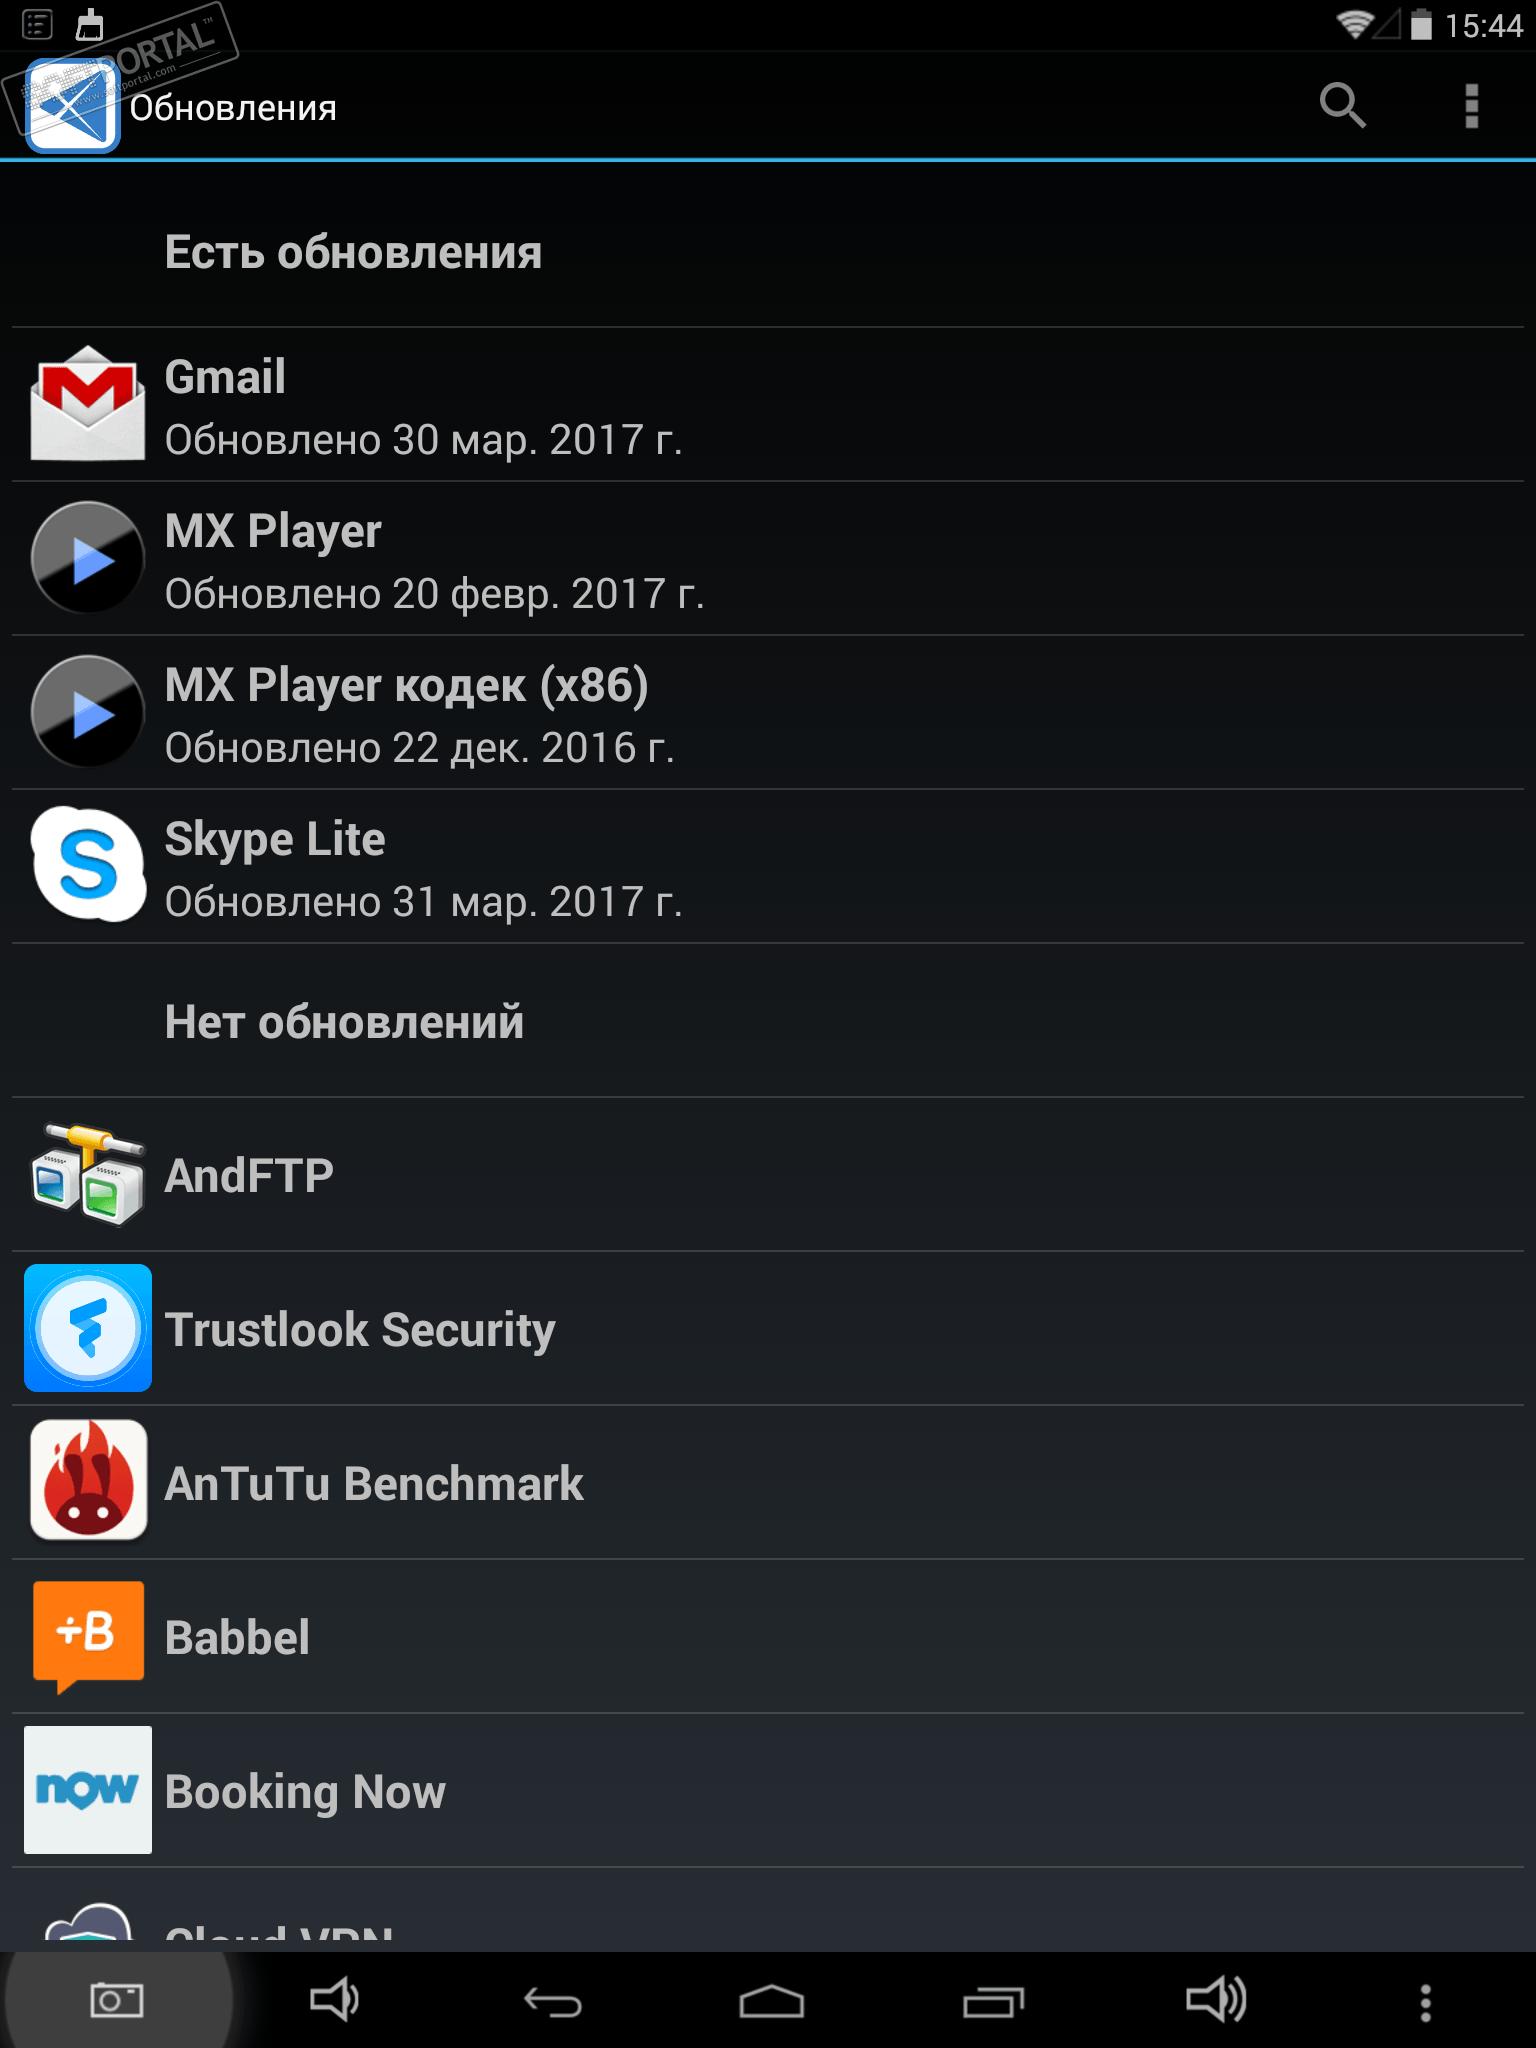 Yalp Store - скачать бесплатно Yalp Store 0 42 для Android